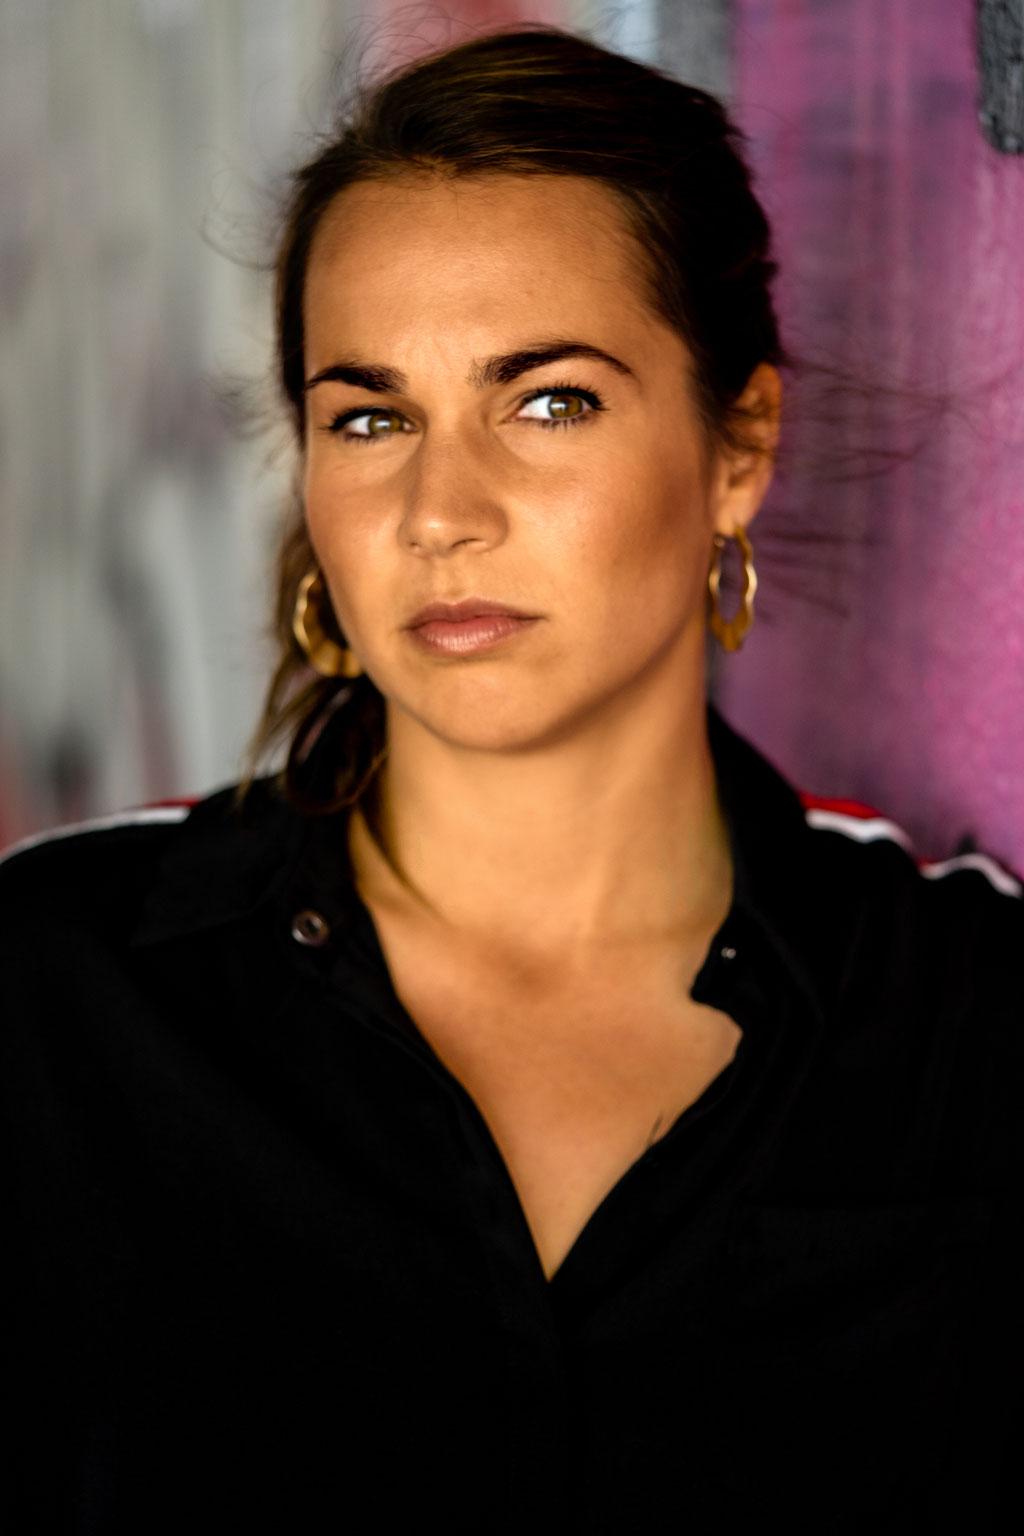 Anaela Dörre - Schauspielerin - Künstlerportrait - Frankfurt am Main - Photo by Melina Johannsen